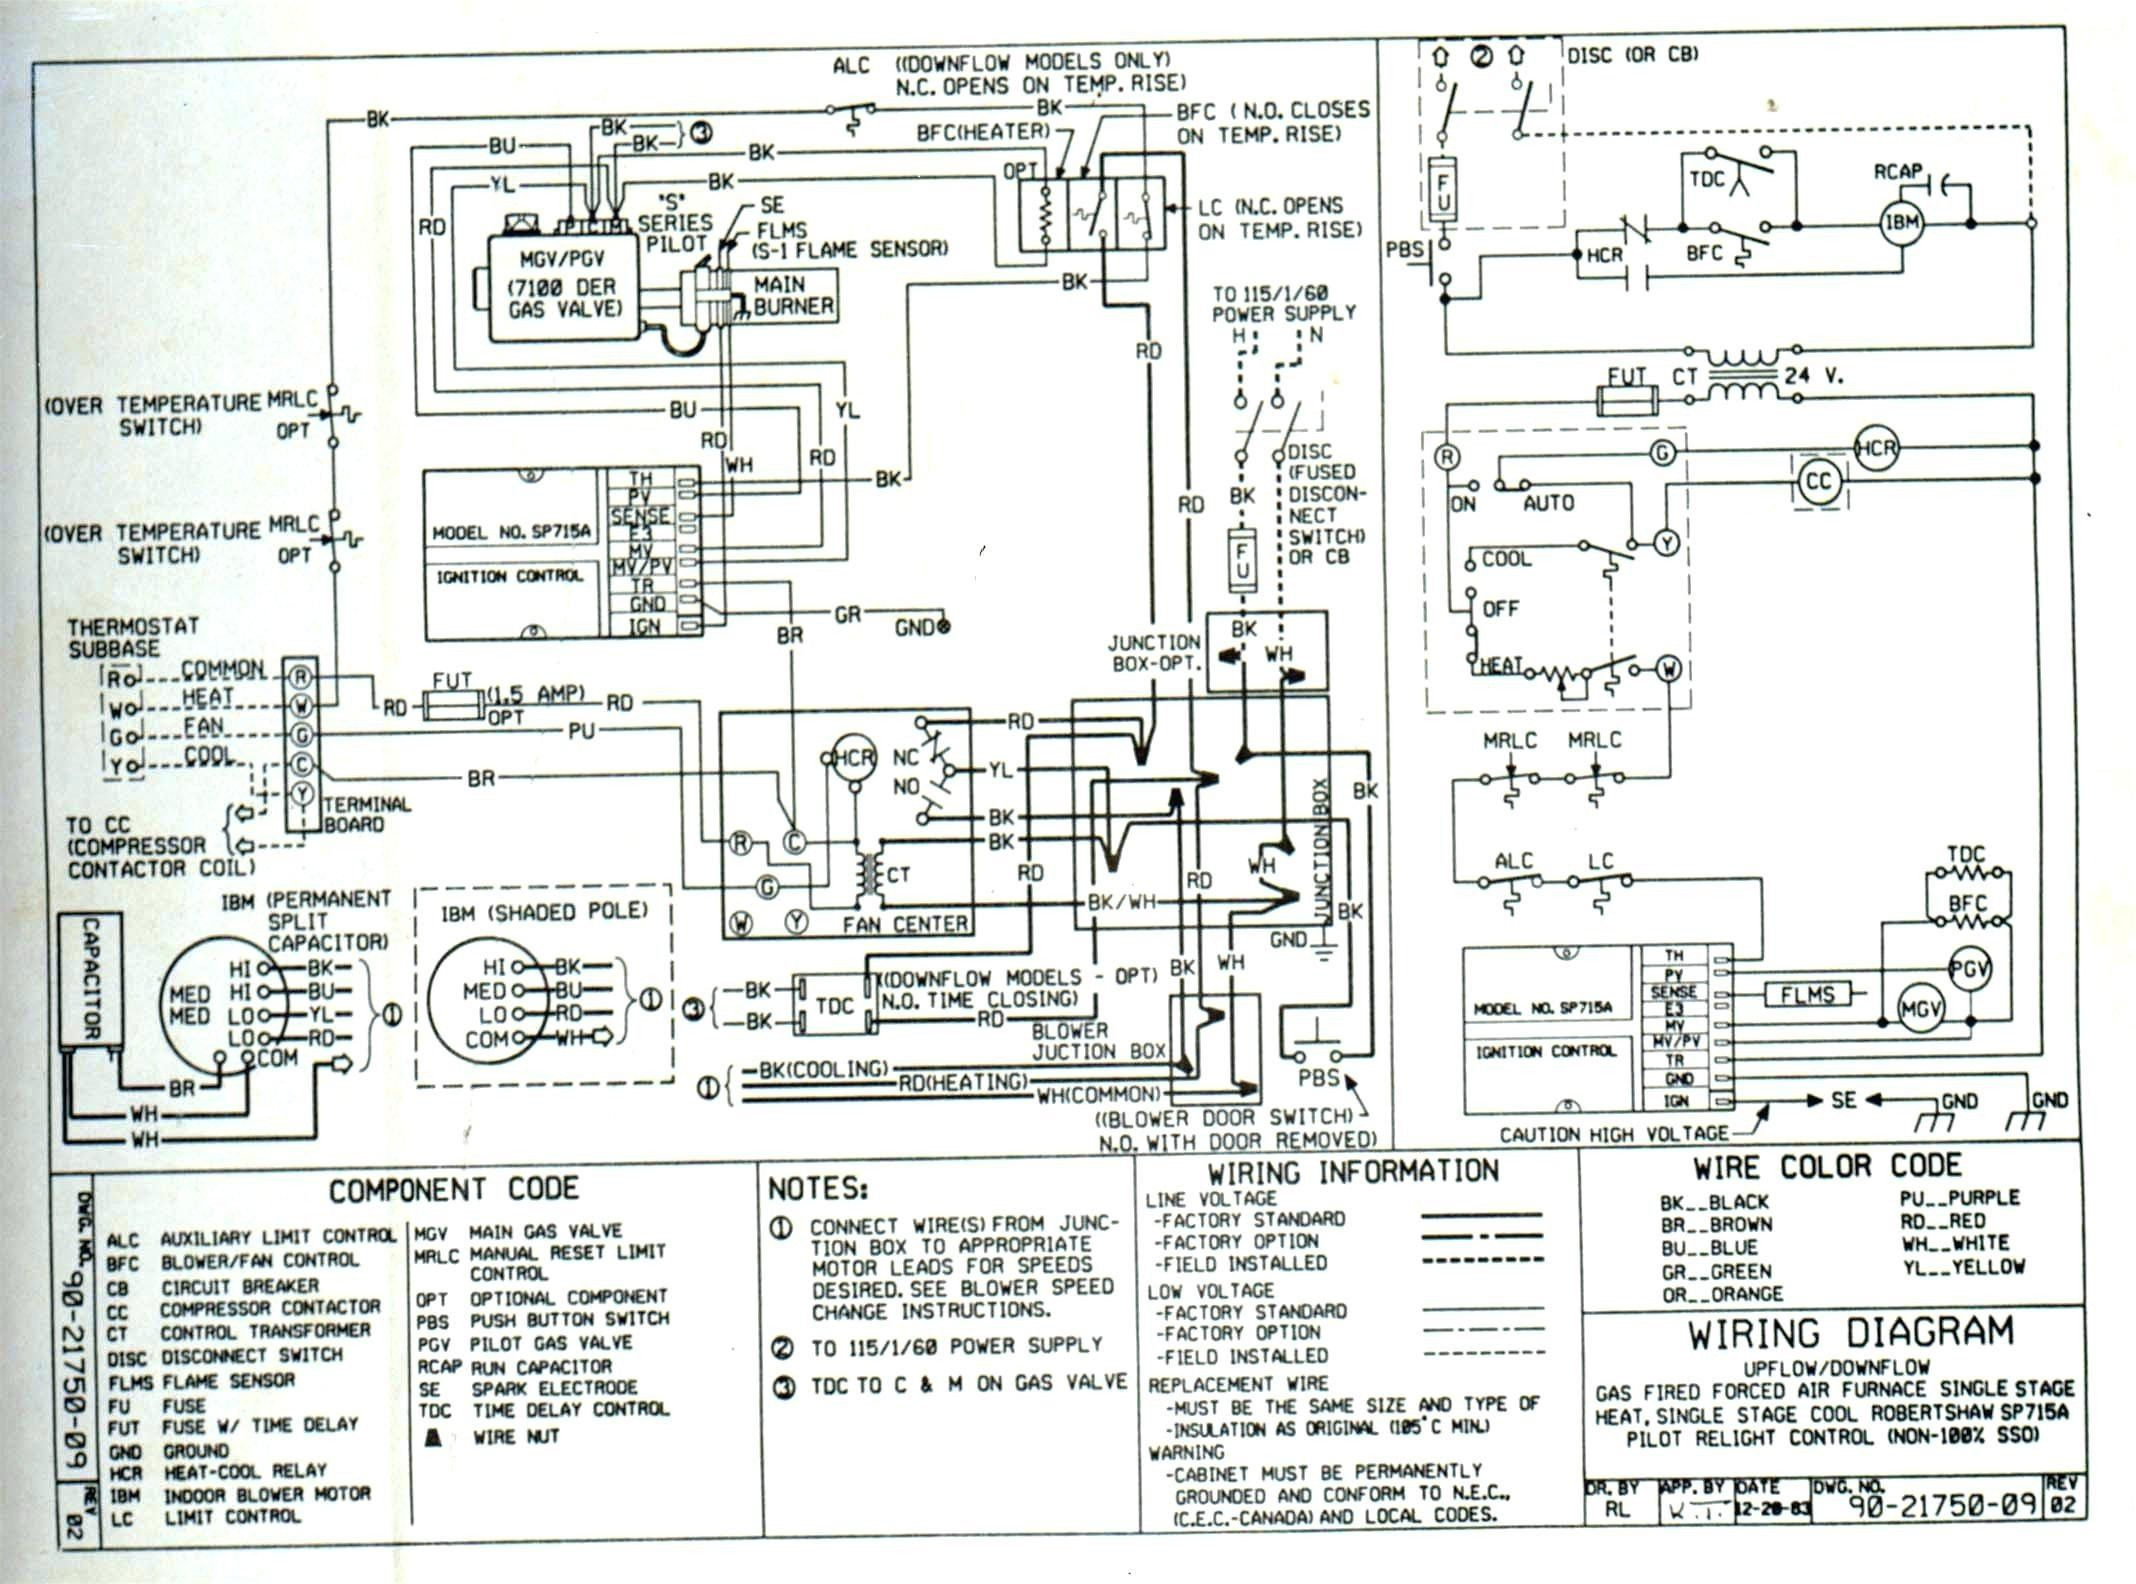 Unique Trane Heat Pump Thermostat Wiring Diagram In